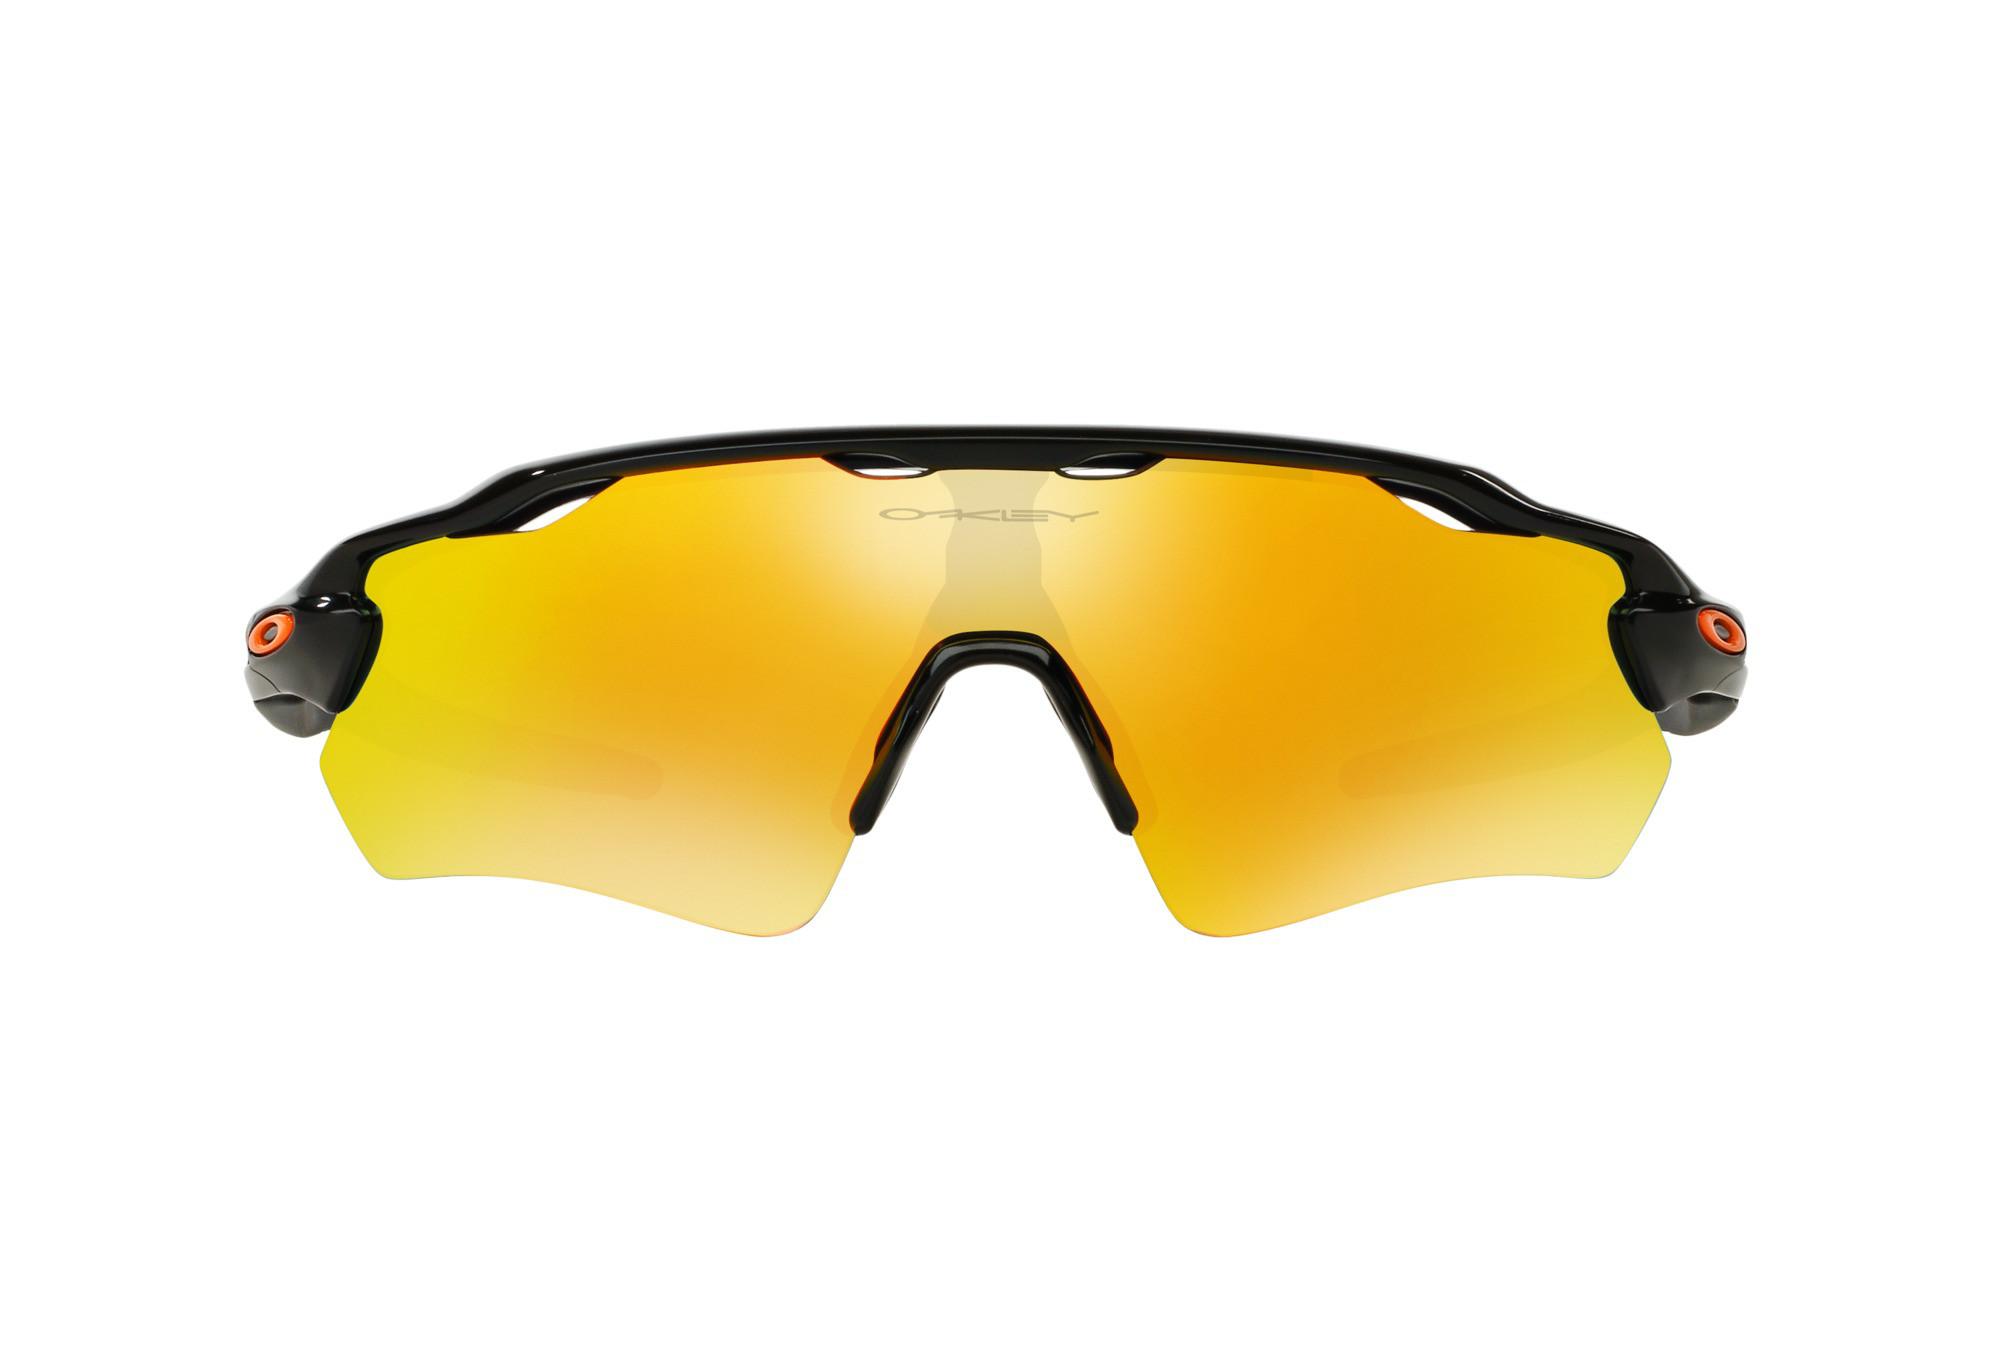 4dceb587140 OAKLEY Sunglasses RADAR EV Path Polished Black   Fire Iridium Ref  OO9208-19